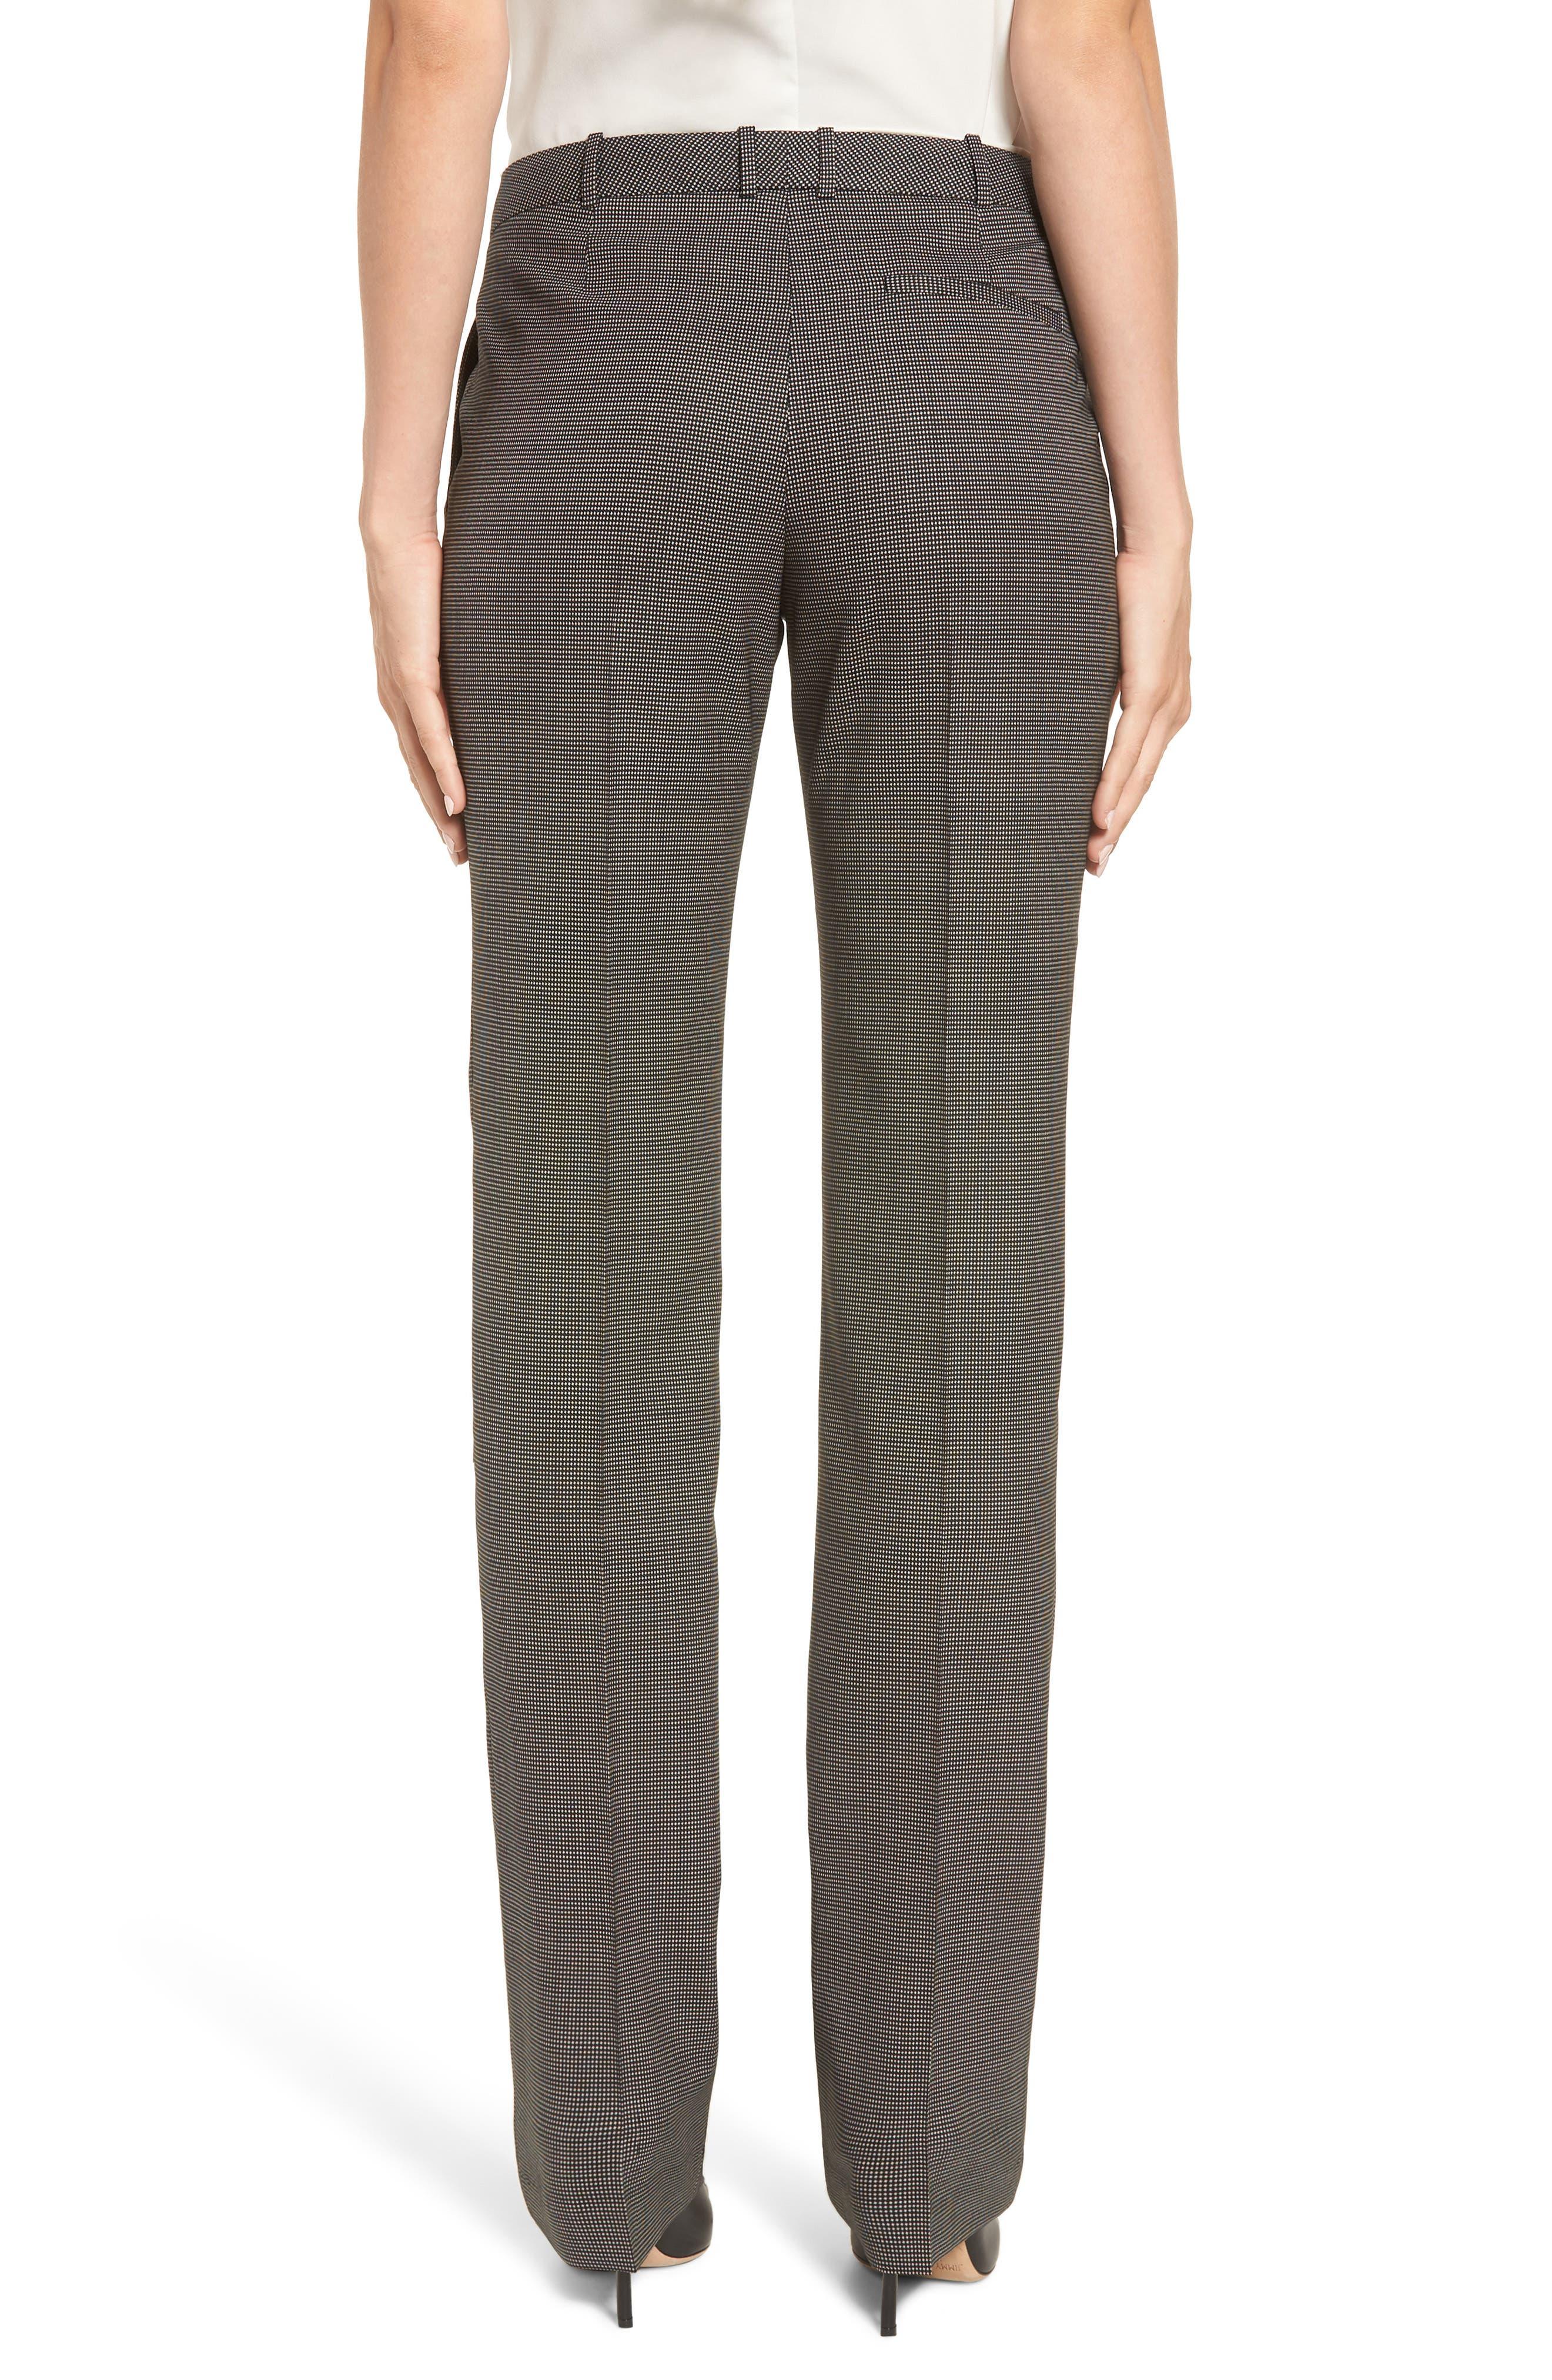 Tamea Minidessin Pants,                             Alternate thumbnail 2, color,                             071